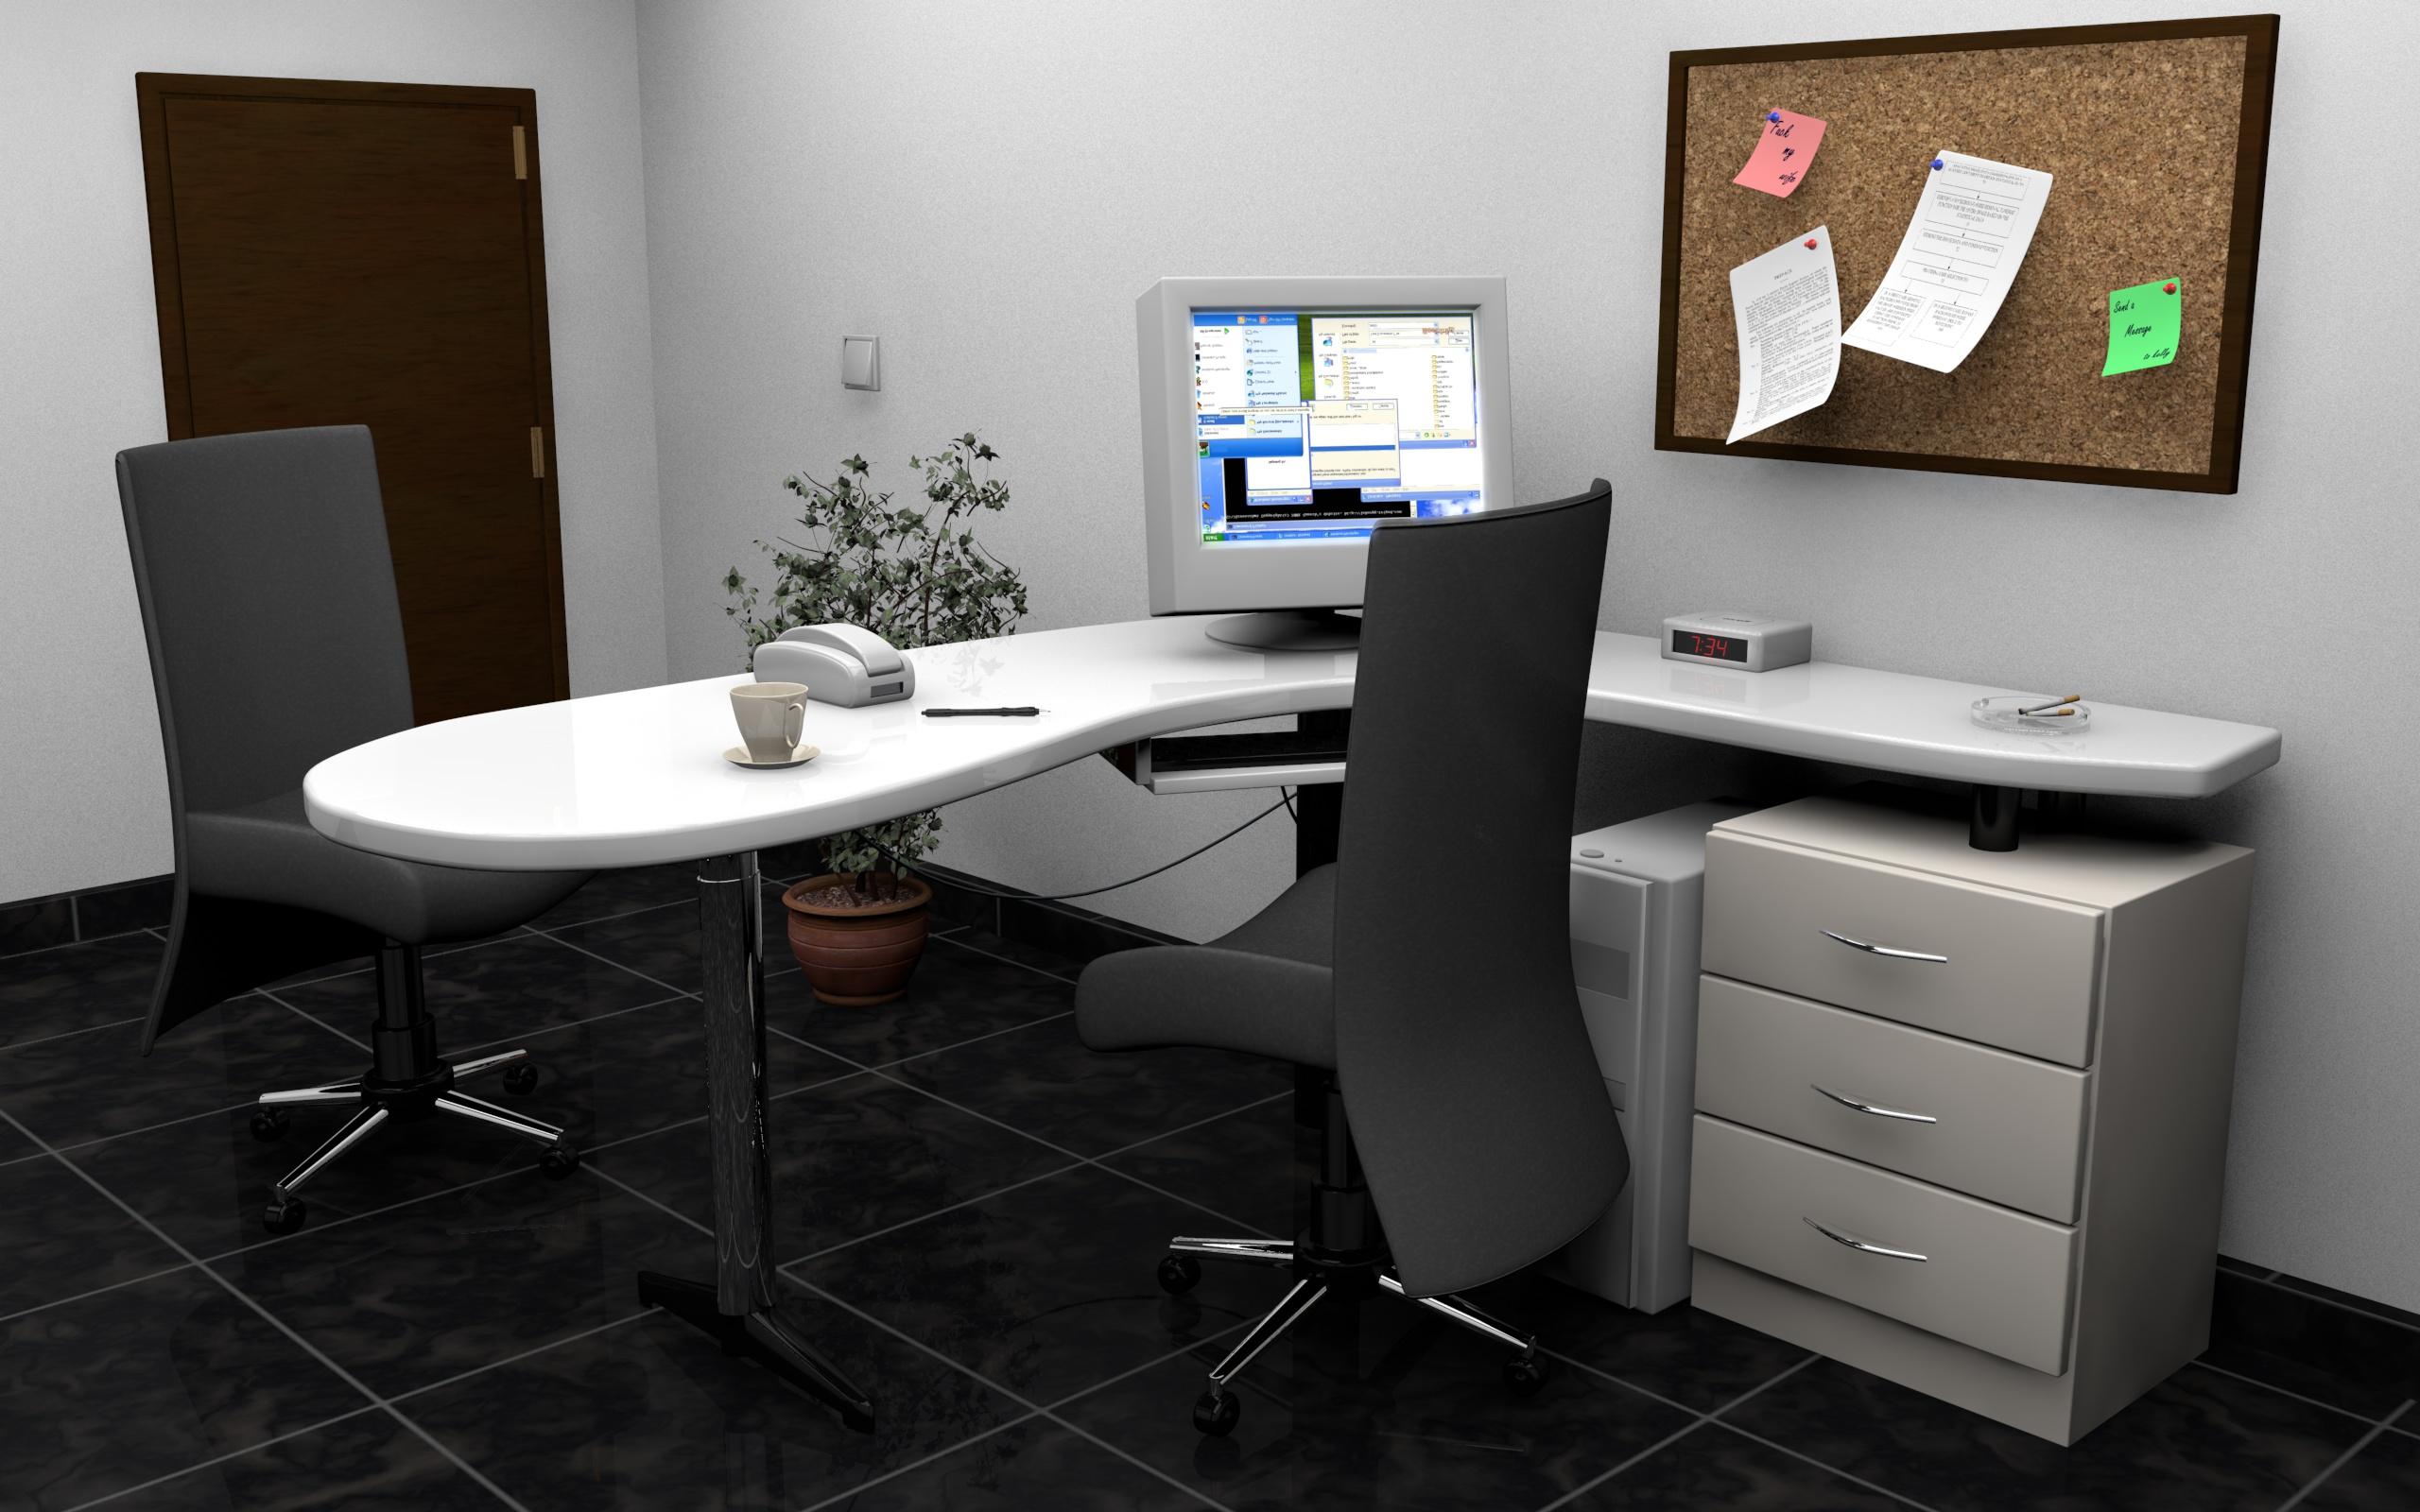 office interior by amitwati on deviantart